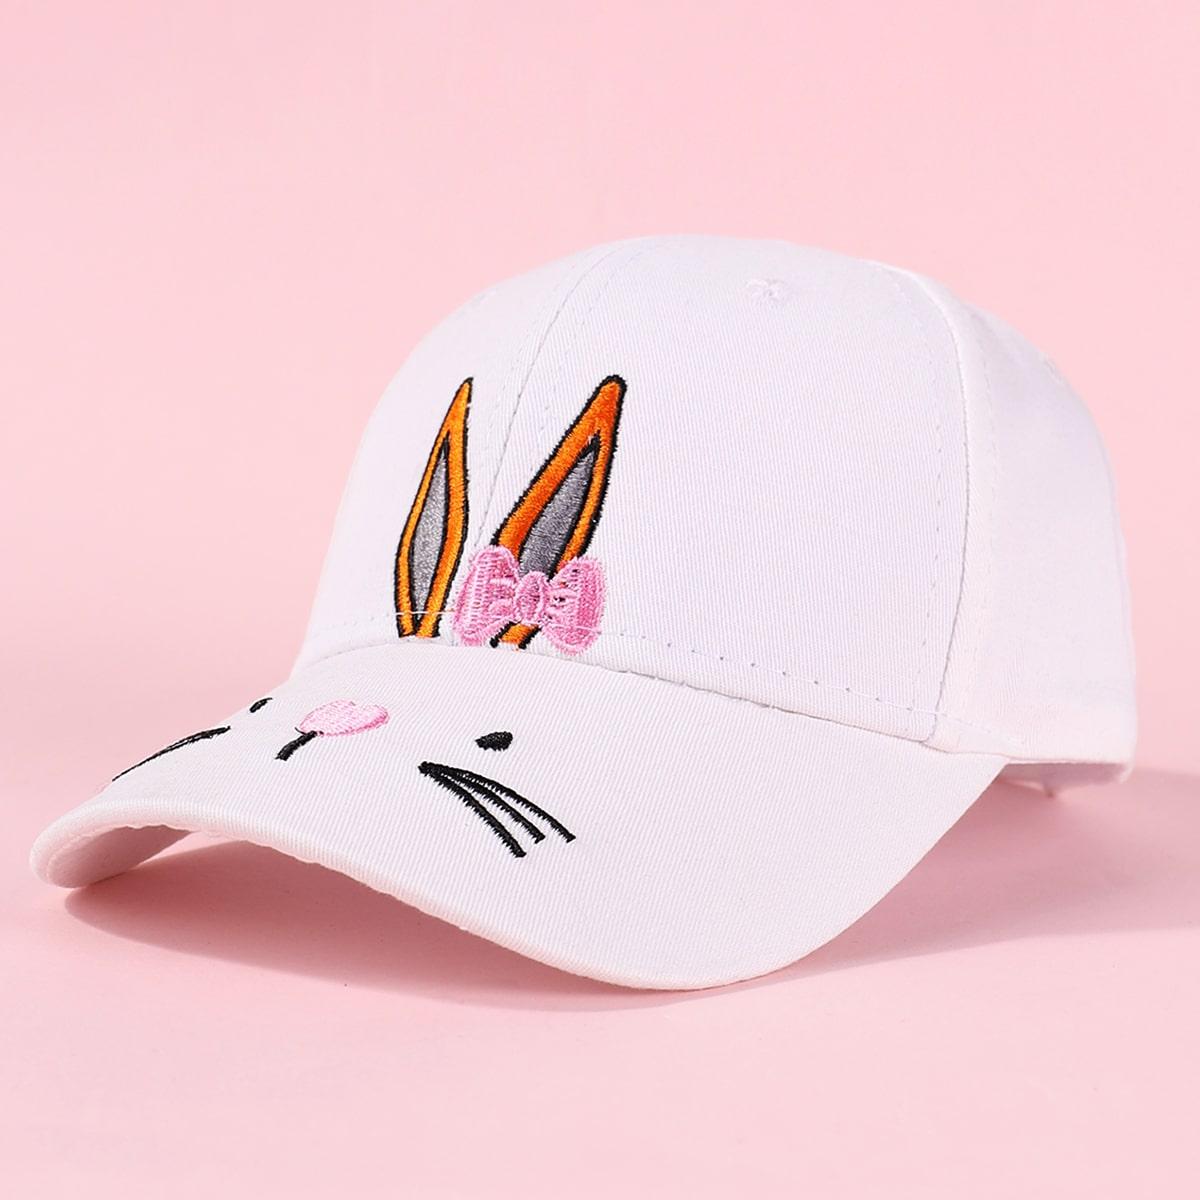 Kinder Baseball Hut mit Karikatur Stickereien